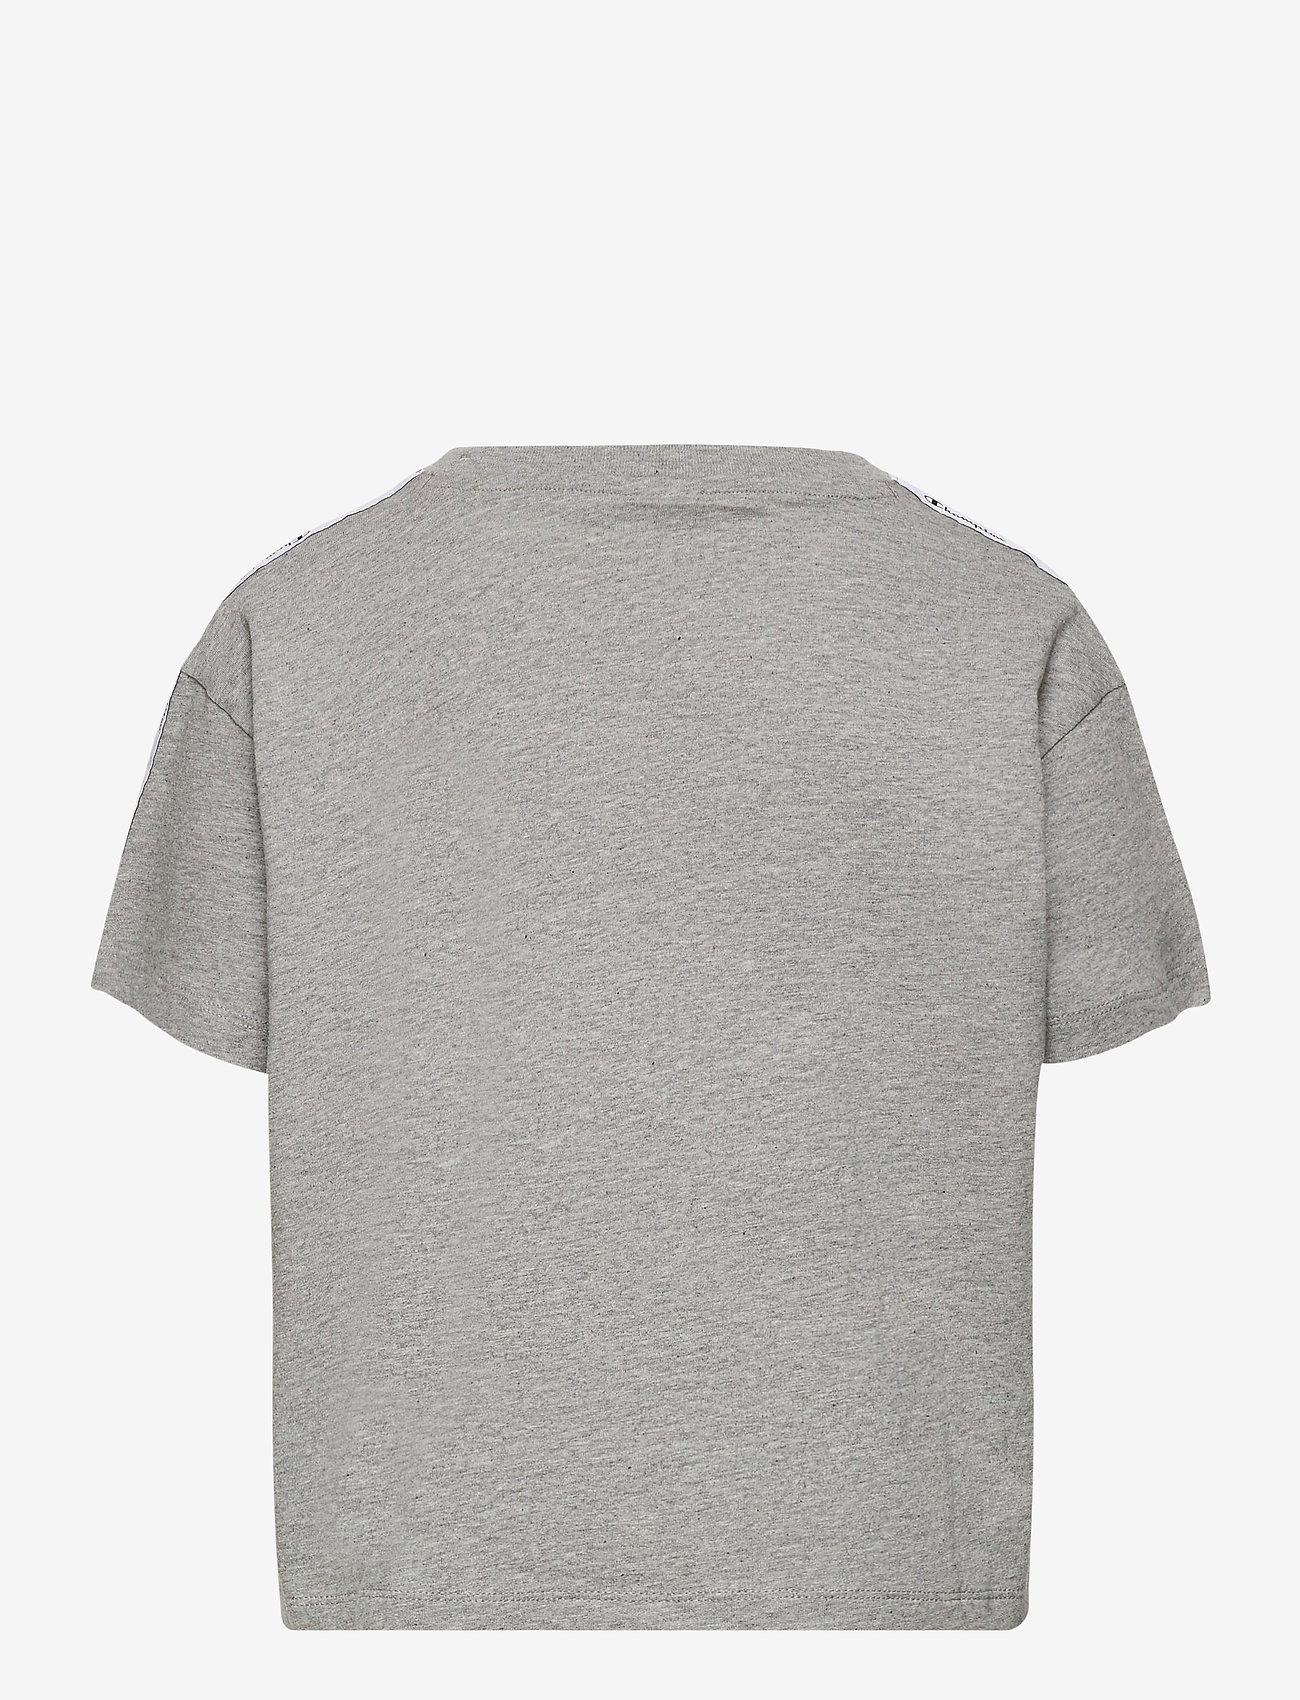 Champion - Crop Top - short-sleeved - gray melange light - 1